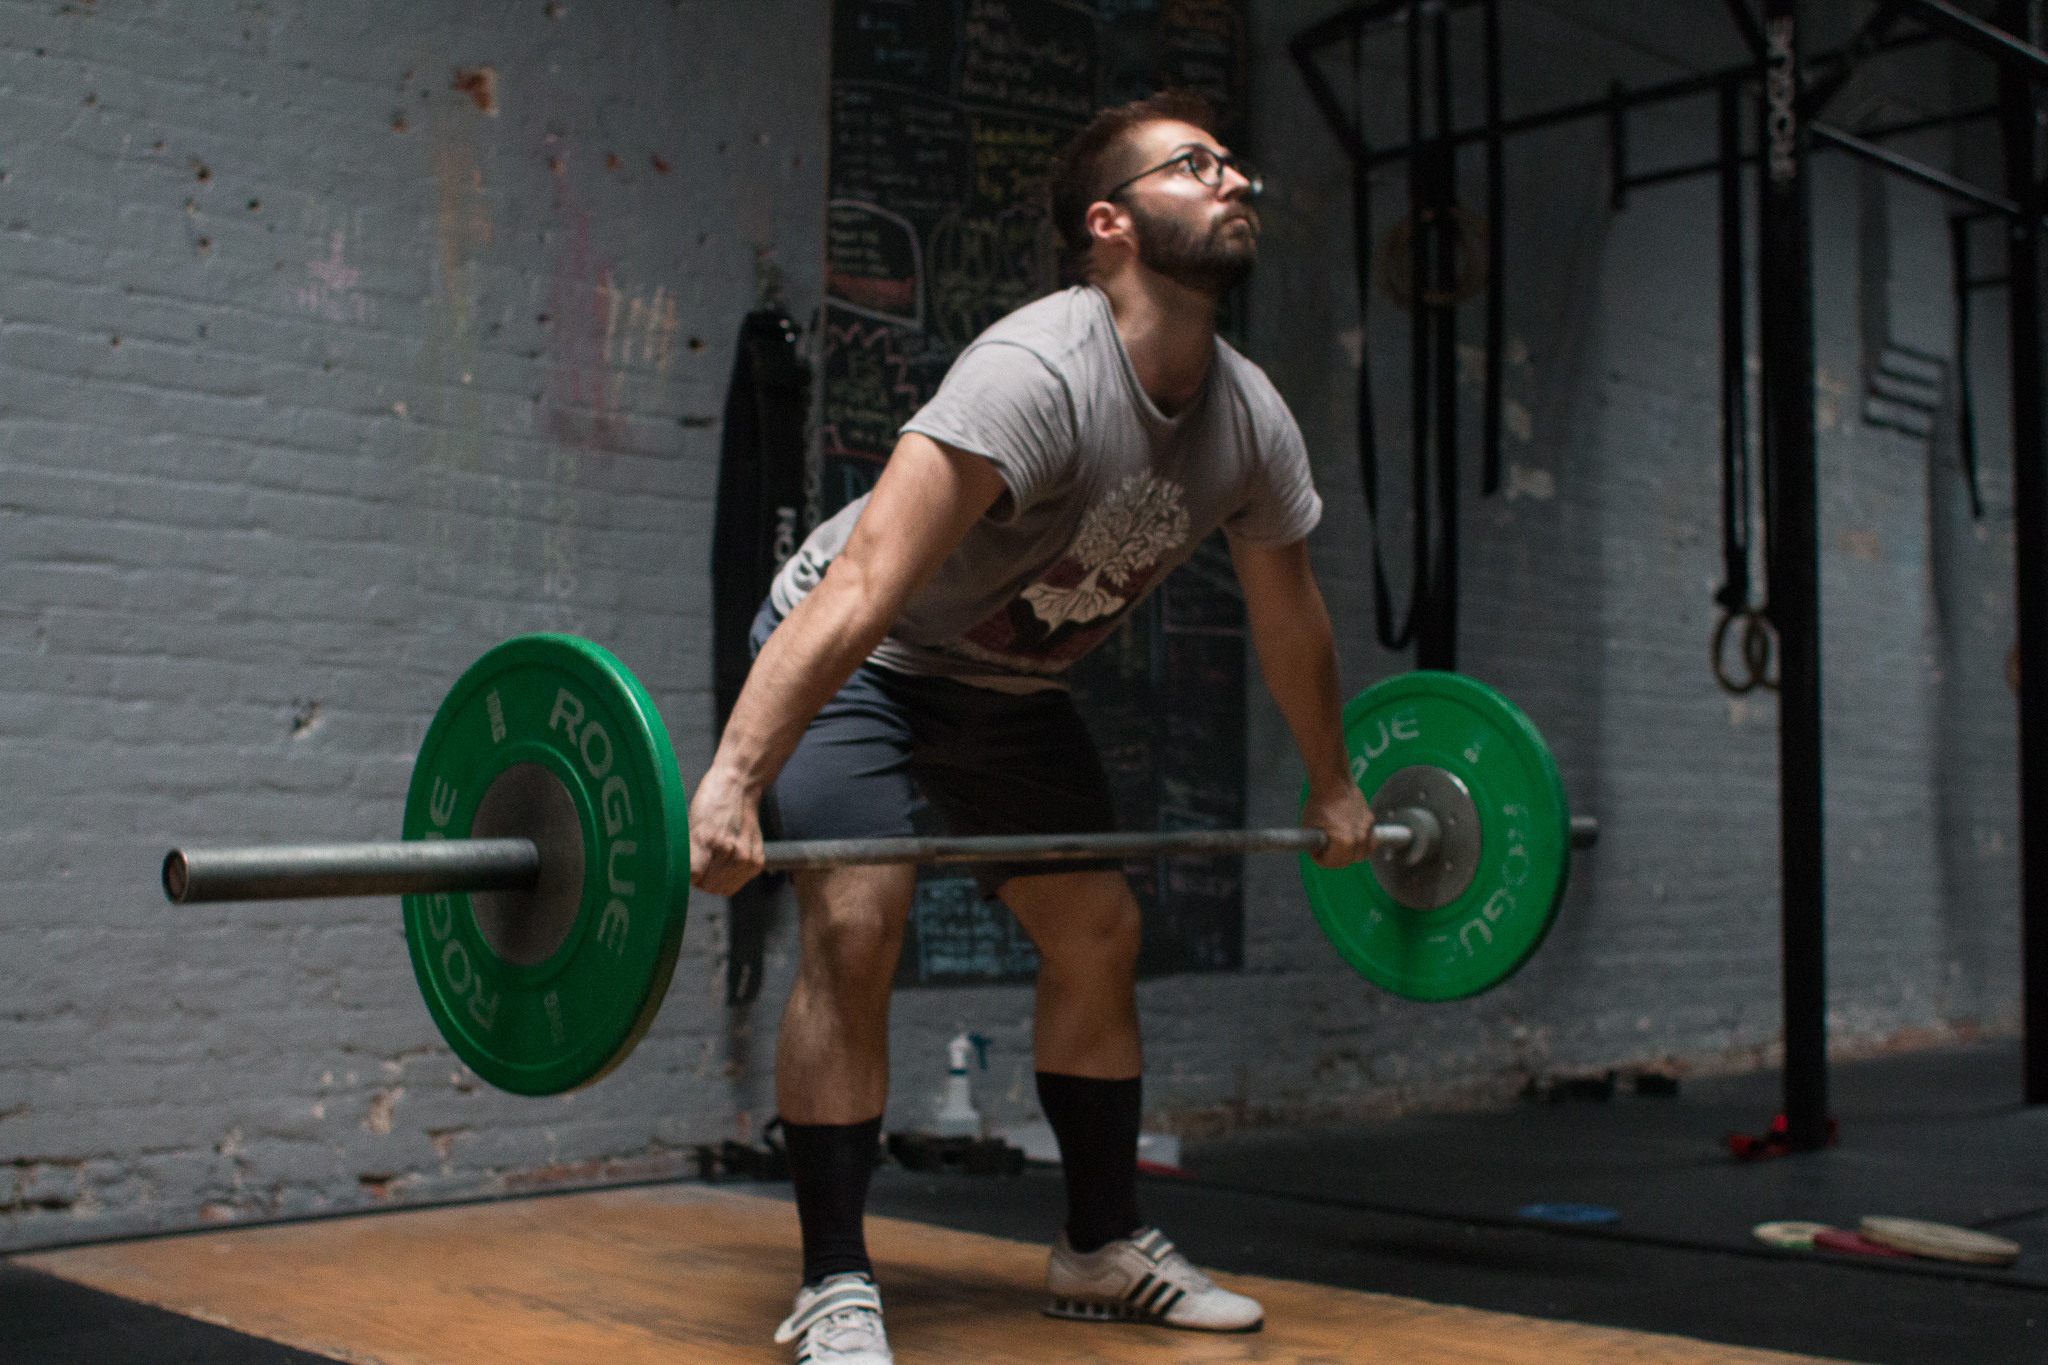 james-wright-visit-brooklyn-new-york-weightlifting-coach-teammates-october-2016 (44 of 92).jpg